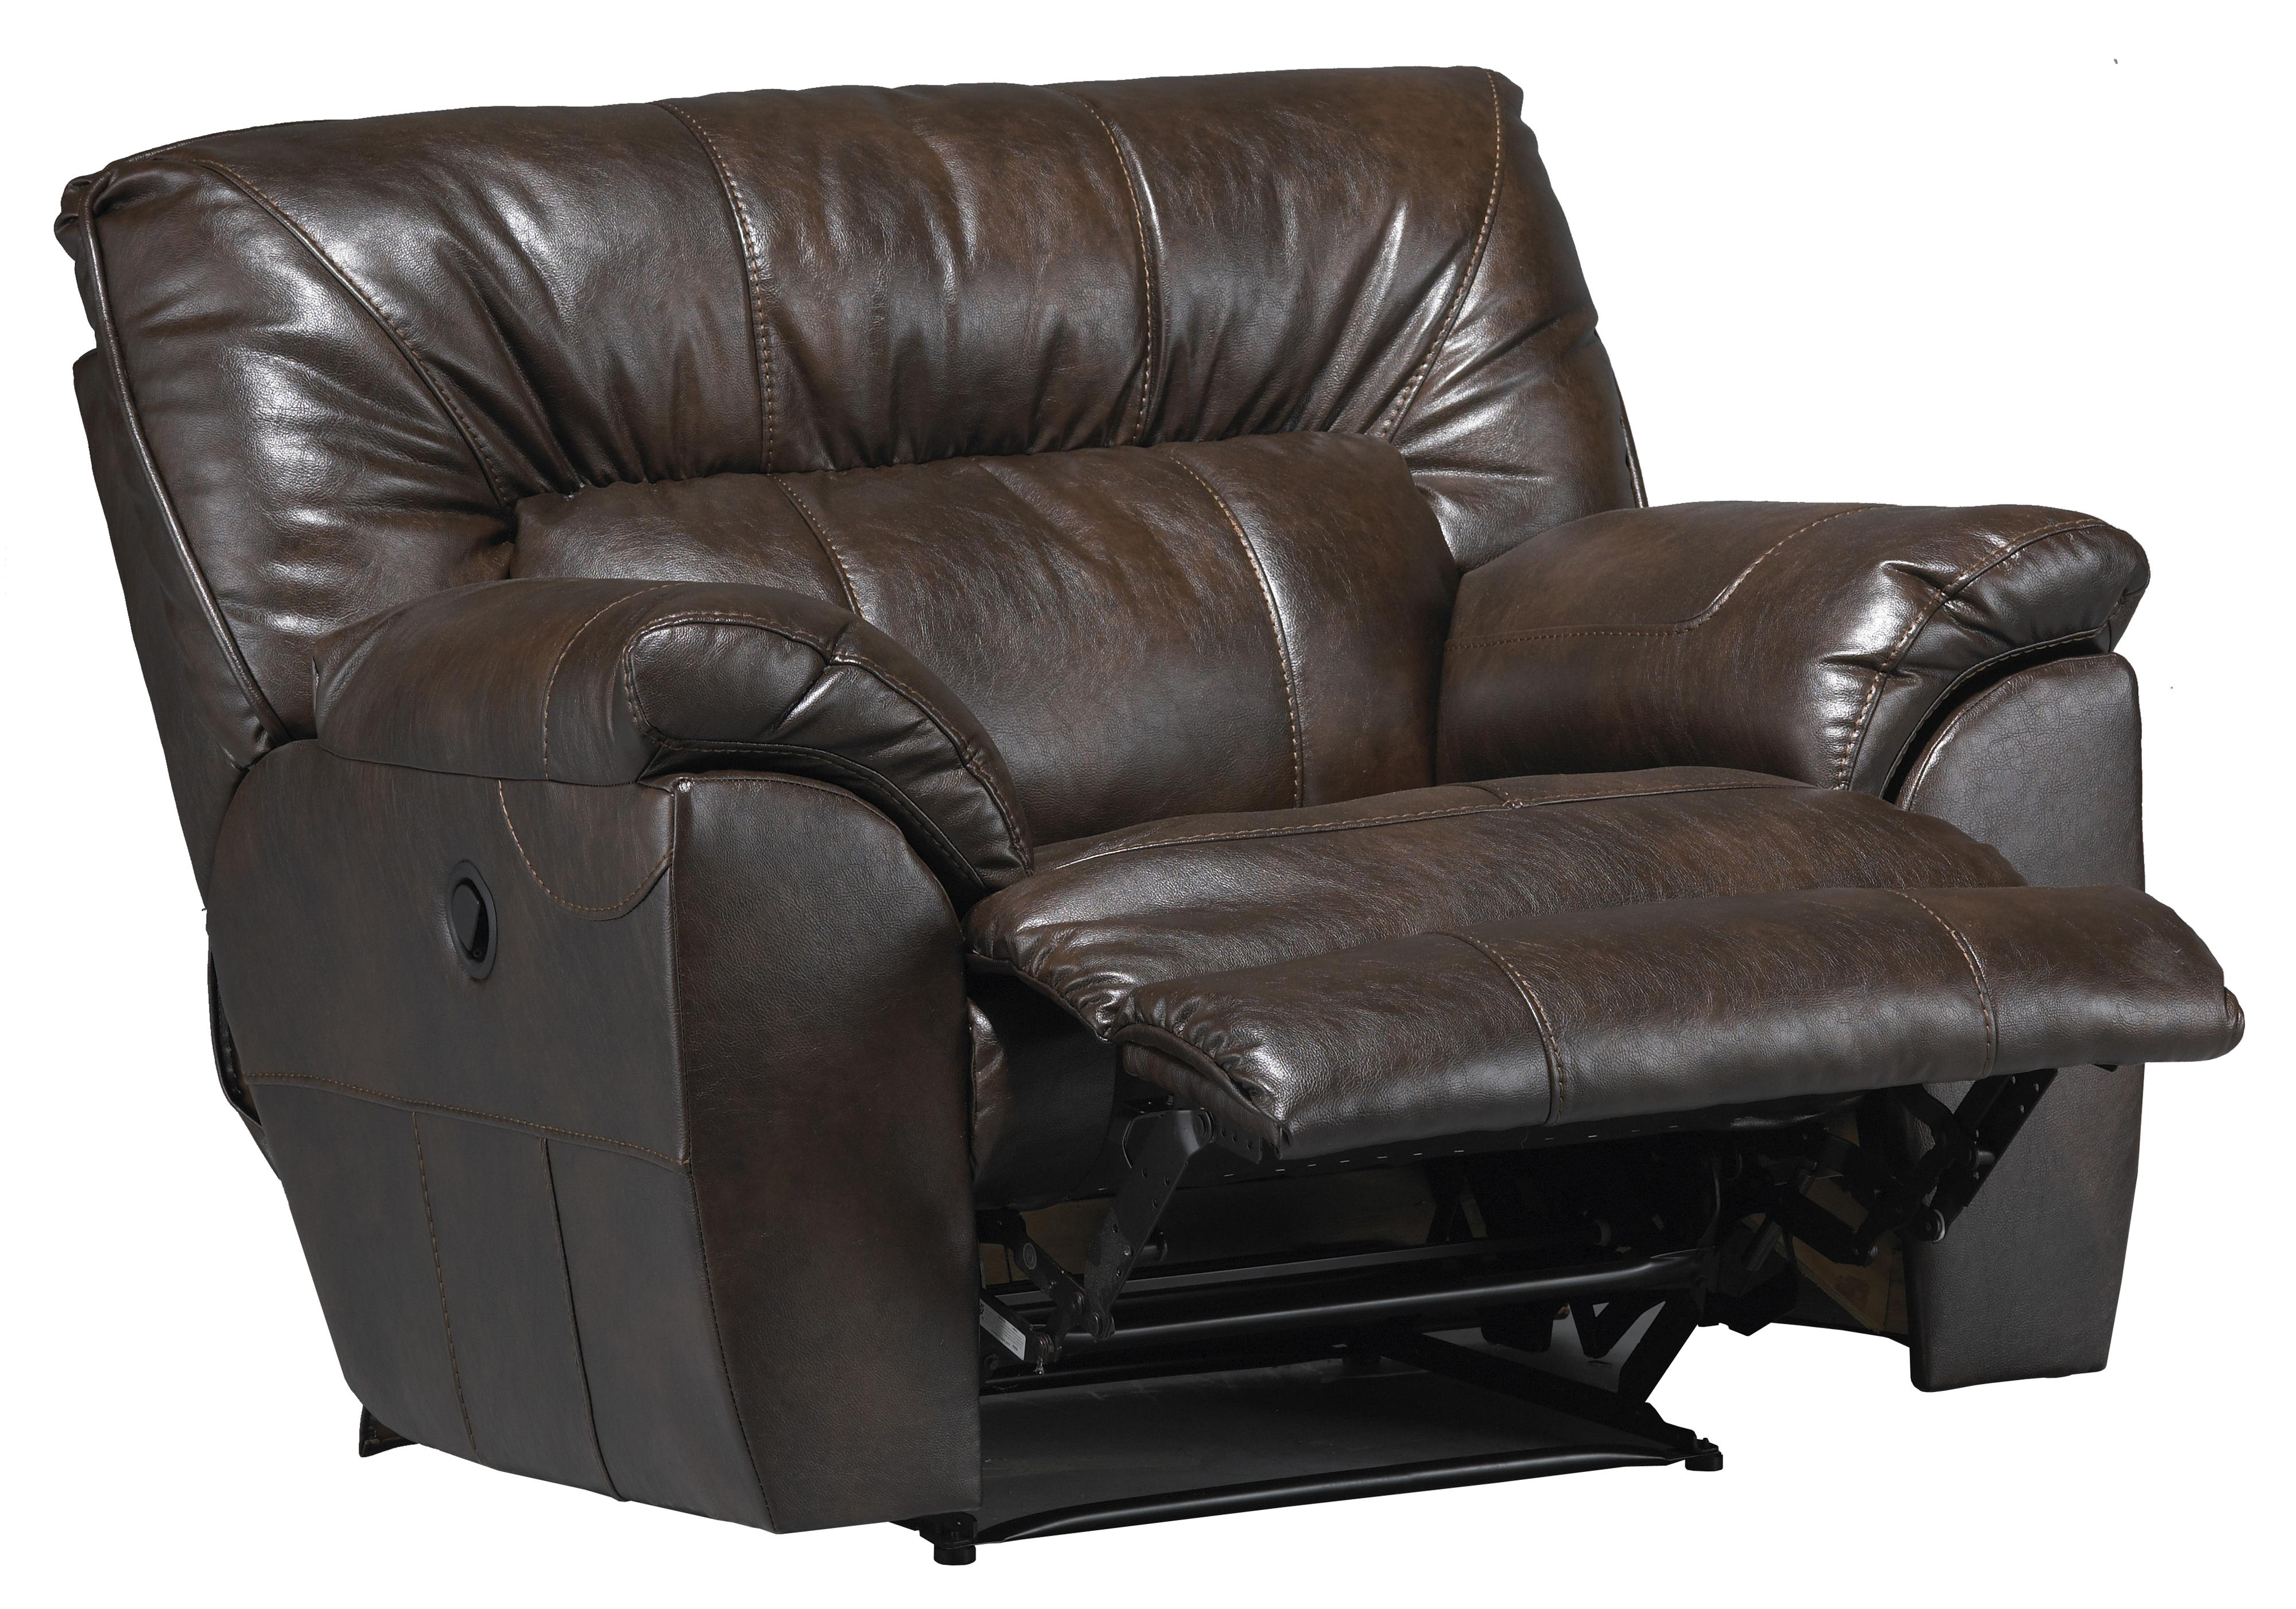 Catnapper nolan power extra wide cuddler recliner with for Catnapper cuddler chaise rocker recliner